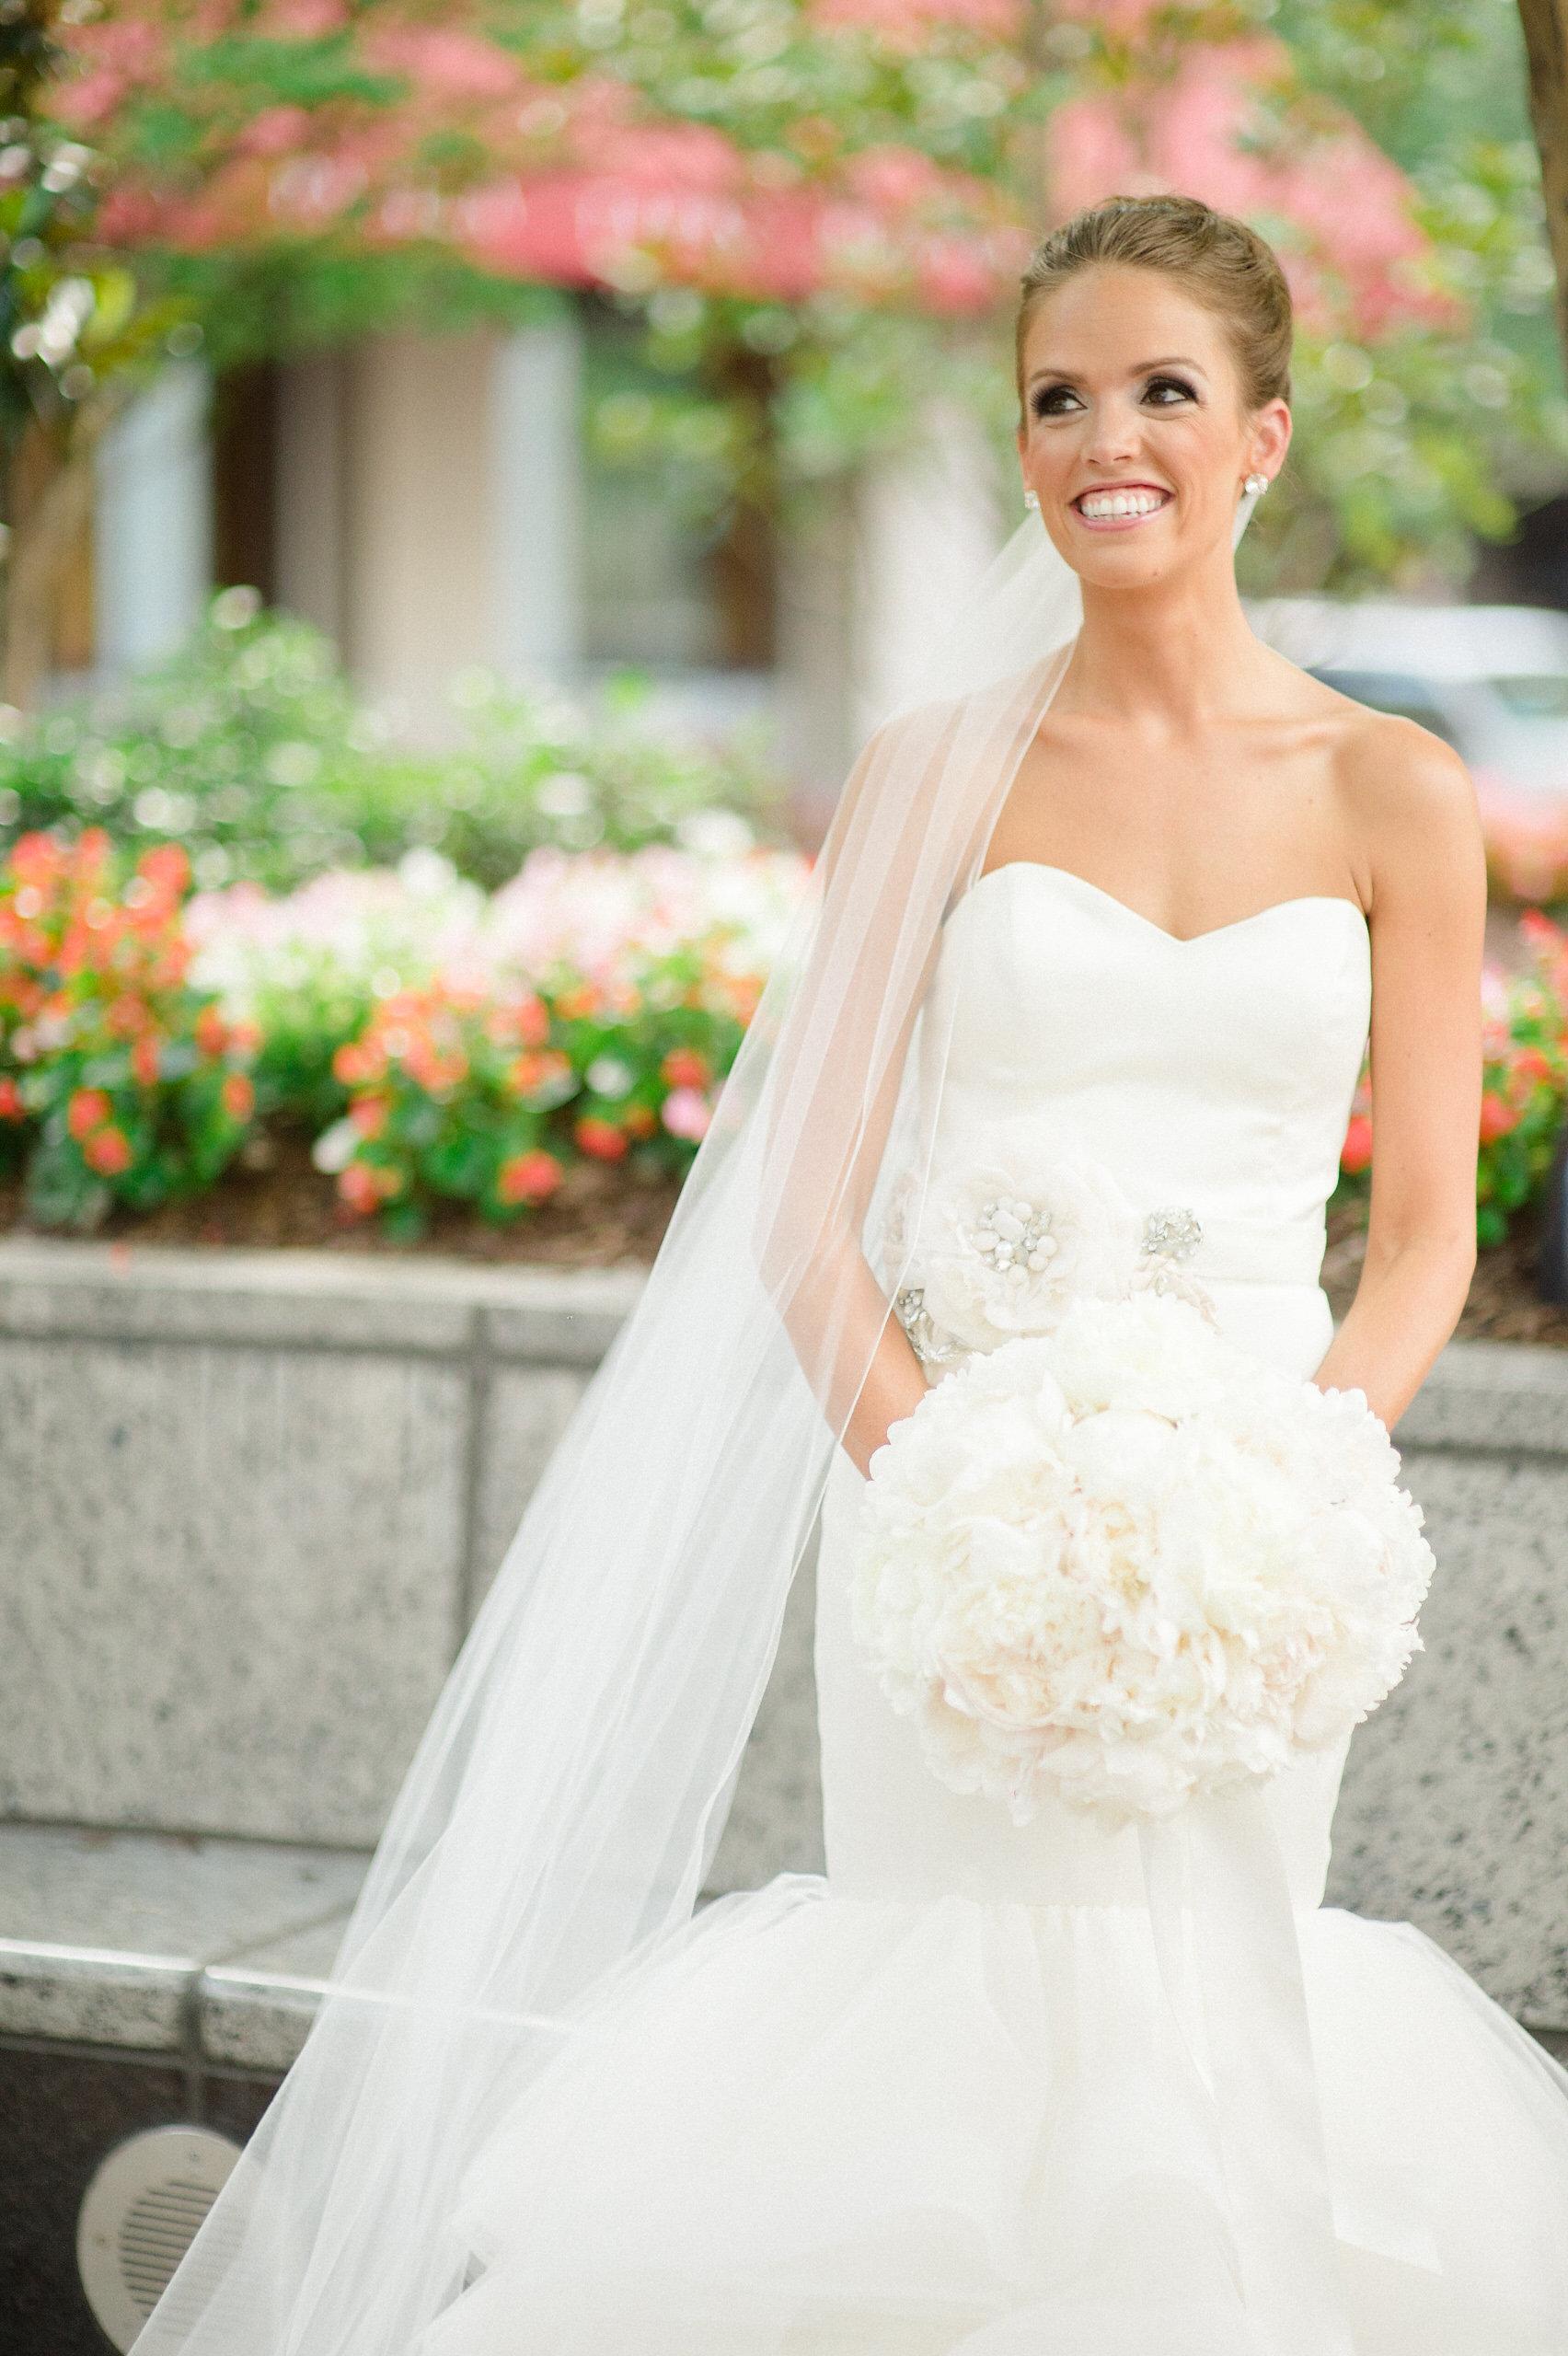 shelby&jordan|smitten&hooked|wedding|groups-144.jpg